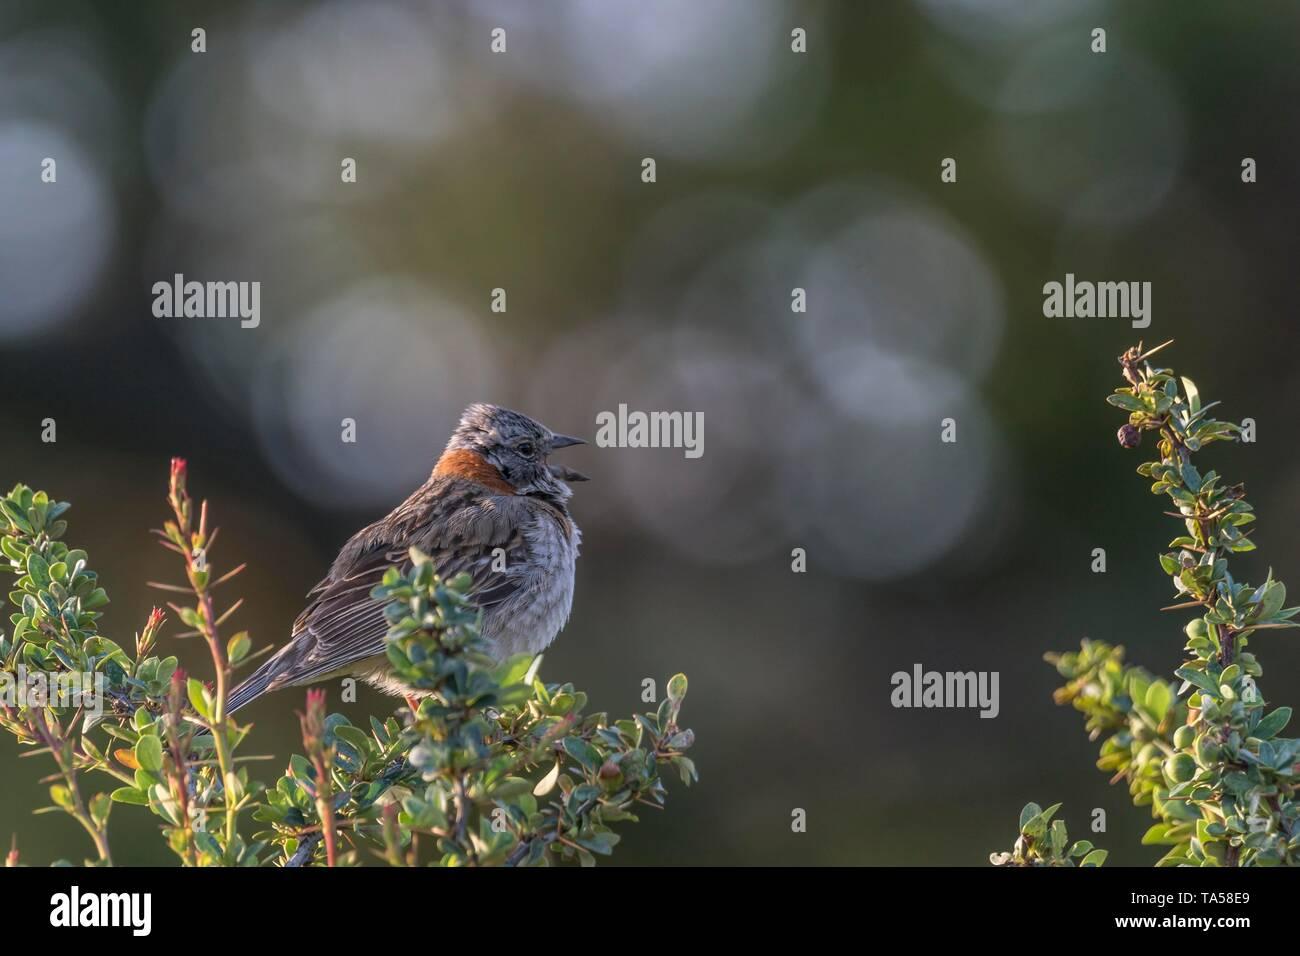 Calling Rufous-collared sparrow (Zonotrichia capensis), Torres del Paine National Park, Region de Magallanes, Patagonia, Chile Stock Photo